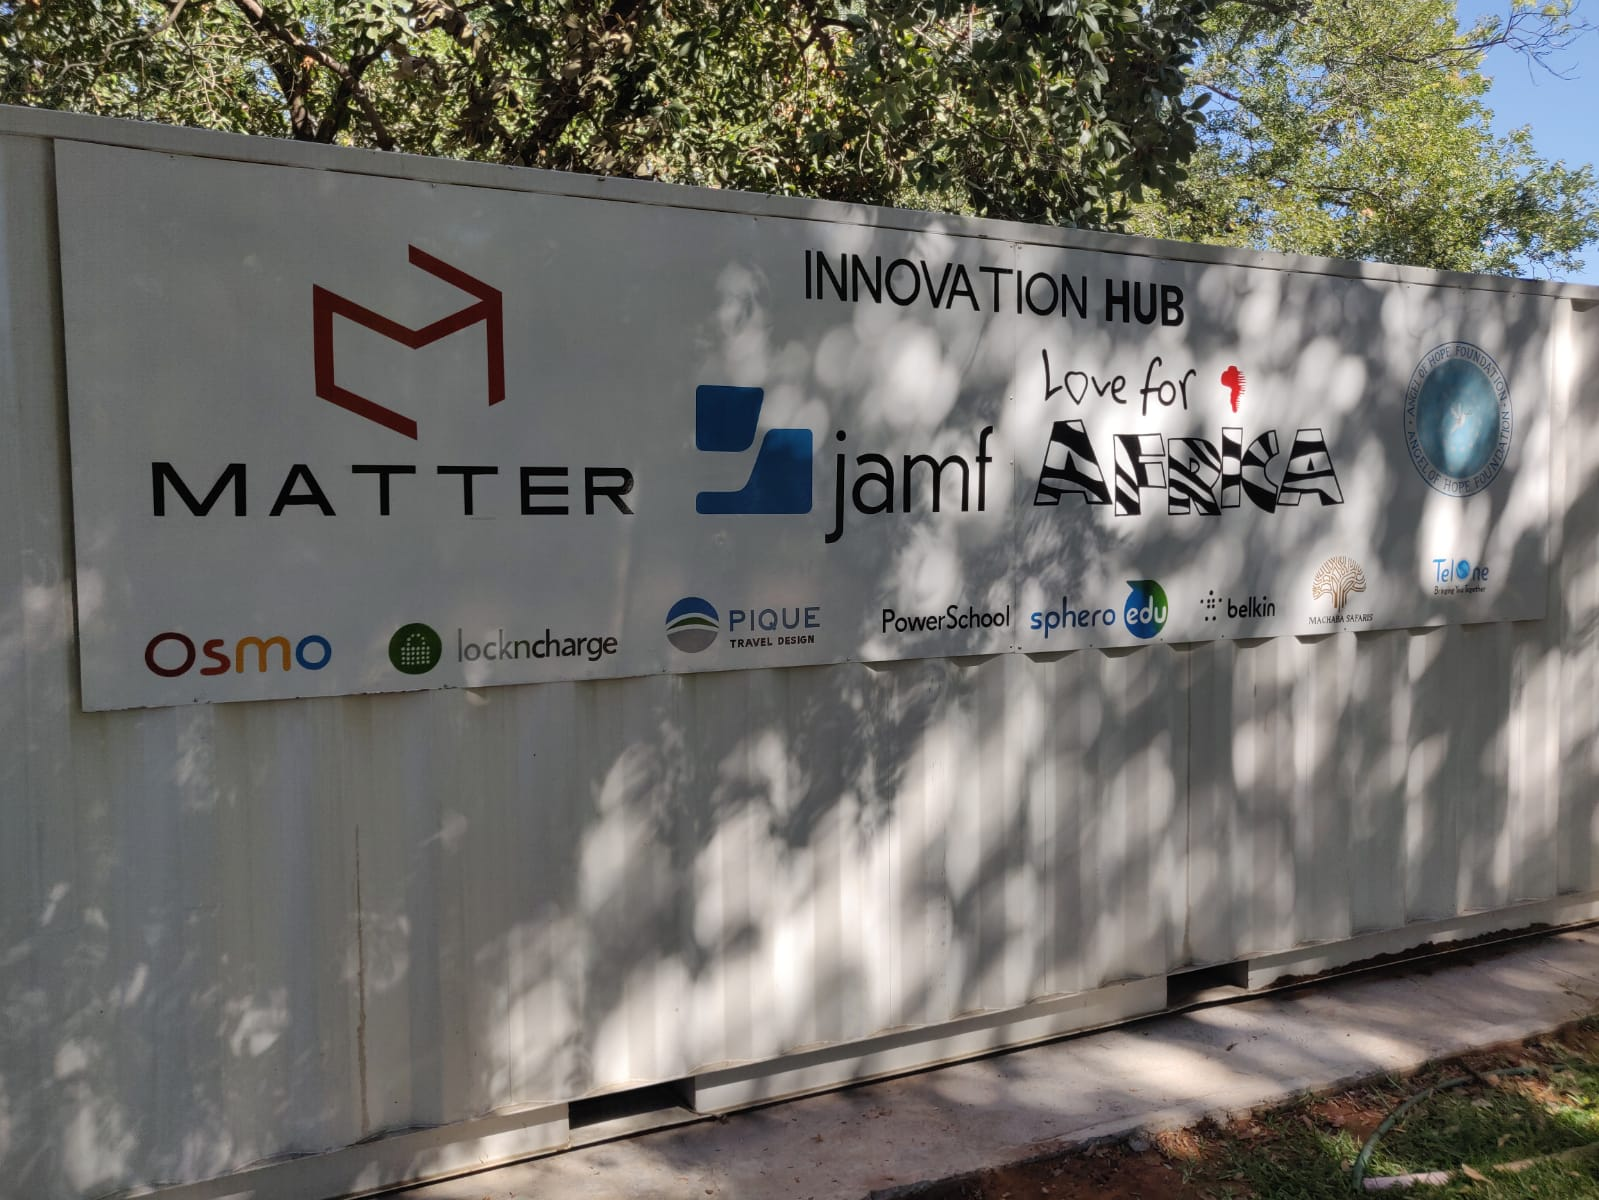 MATTER Innovation Hub in ZImbabwe